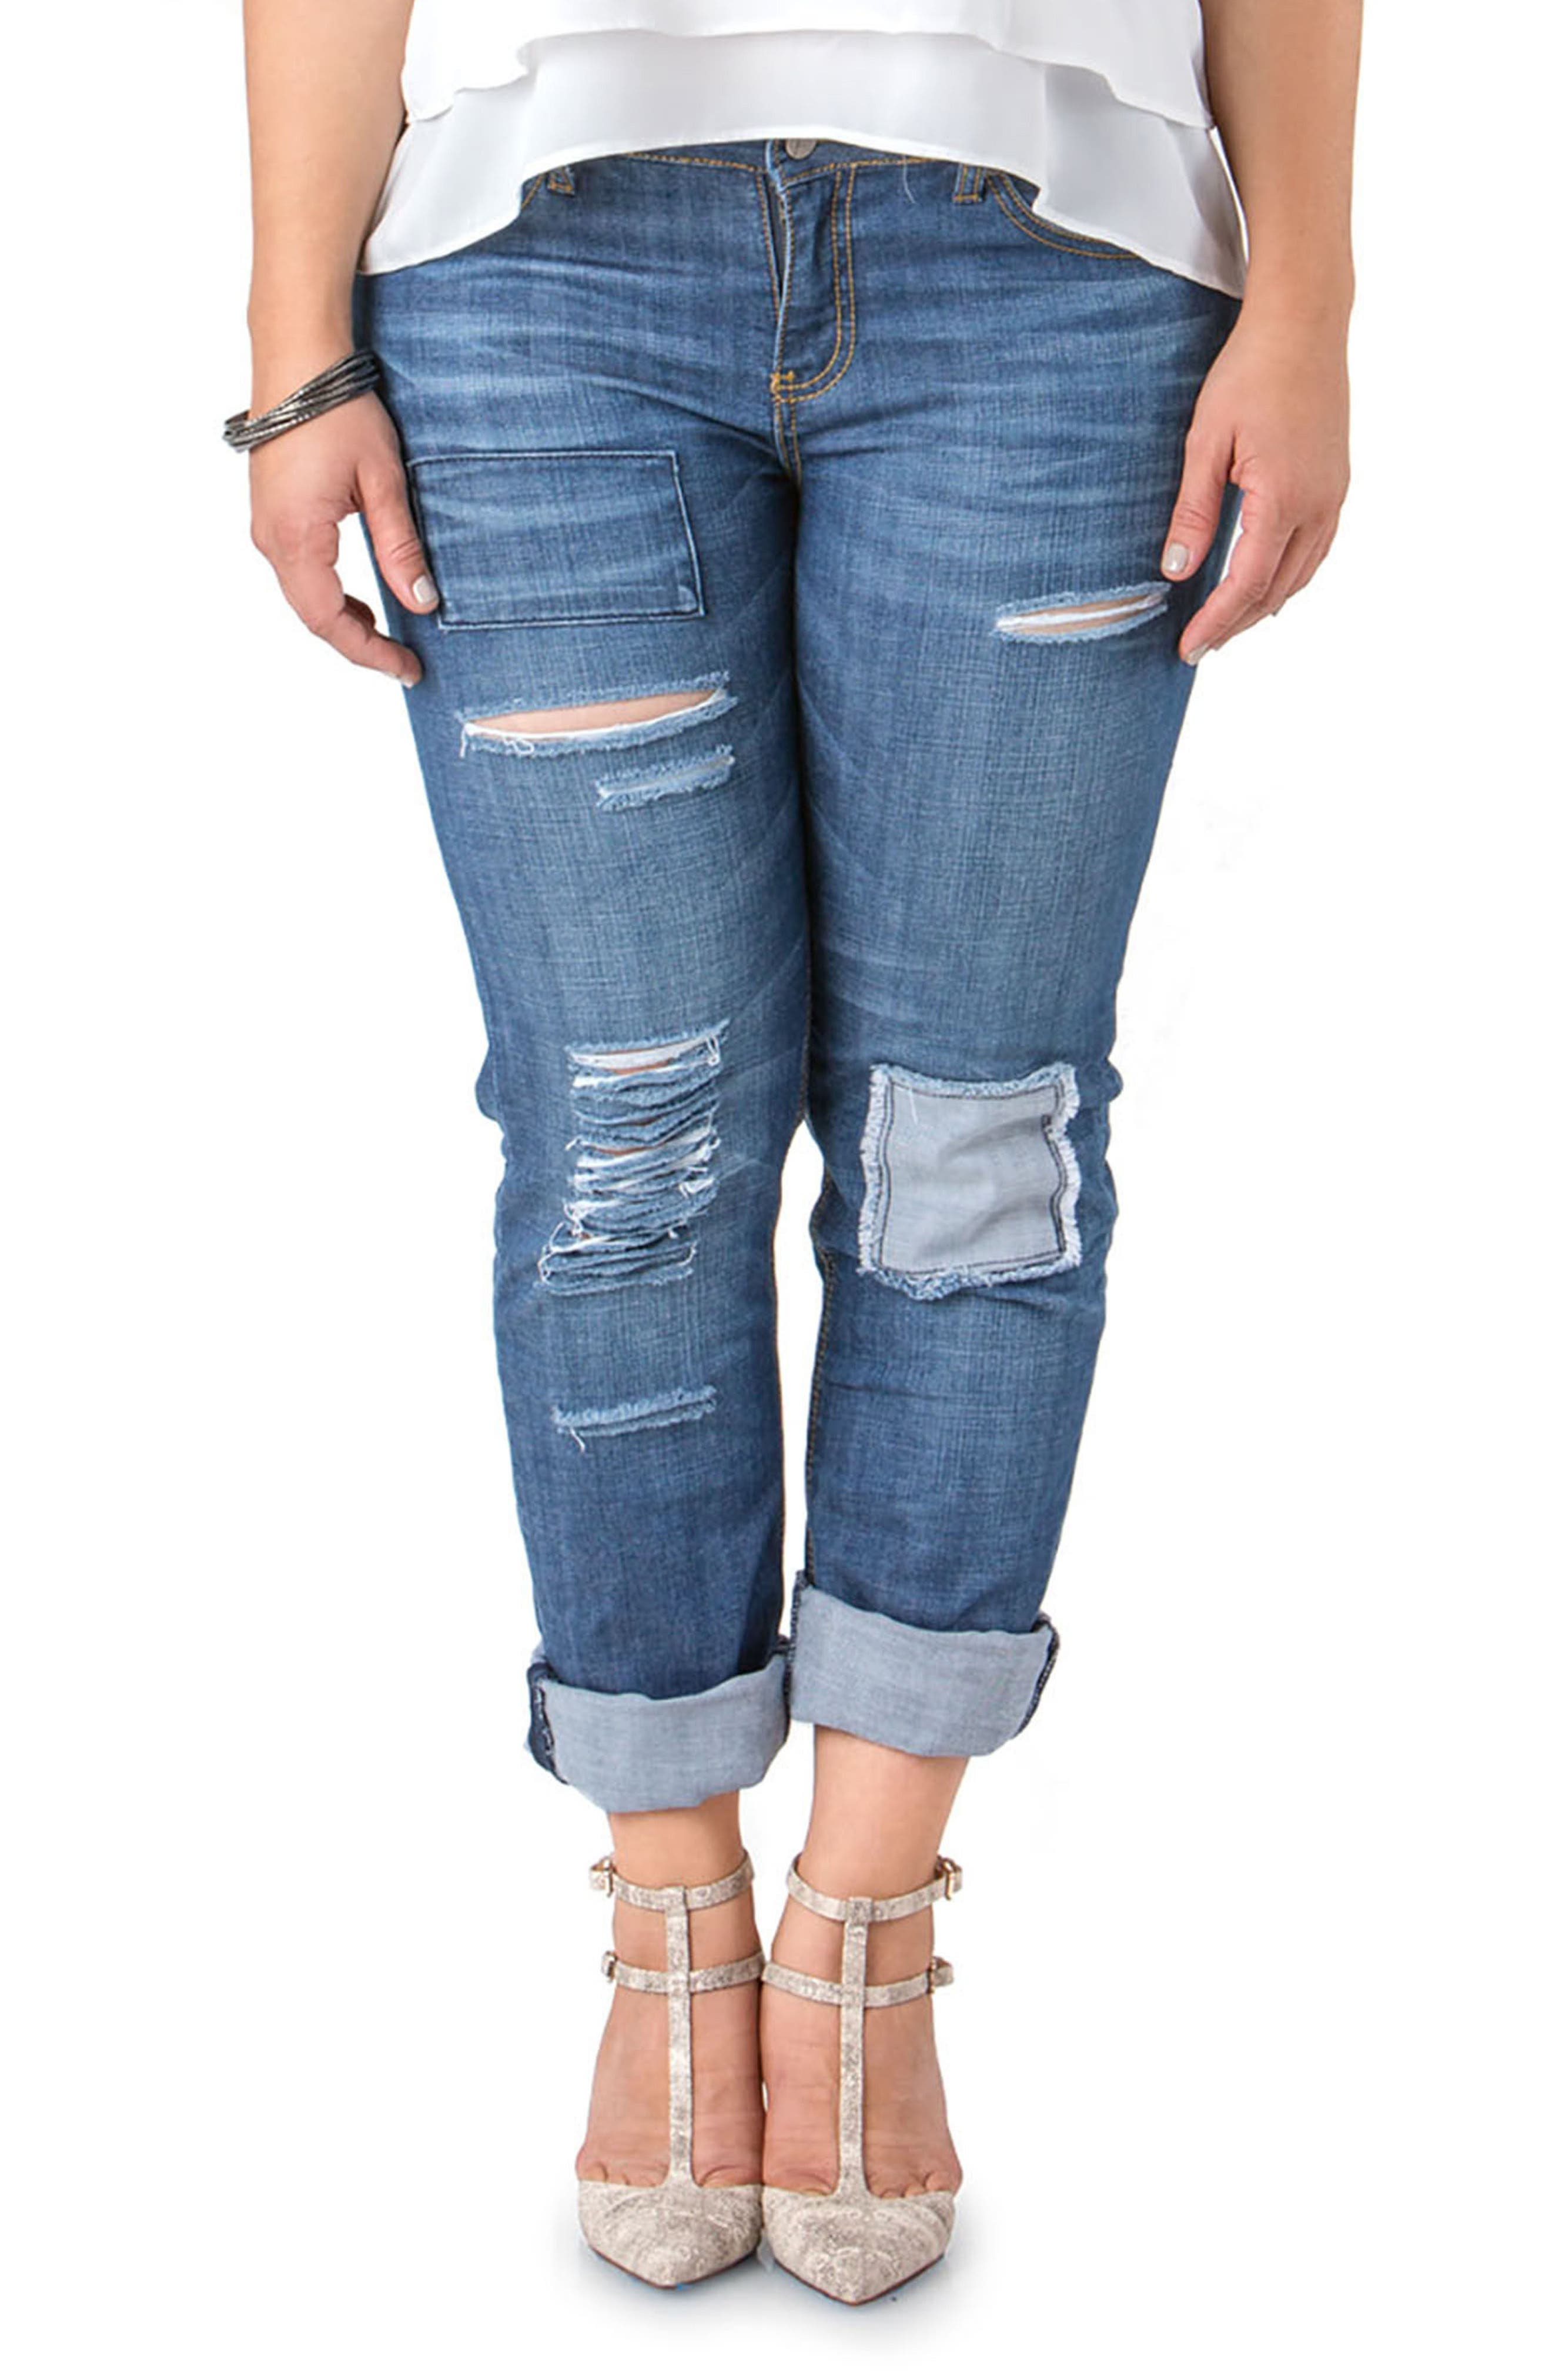 Rip & Repair X-Boyfriend Jeans,                             Main thumbnail 1, color,                             Repair